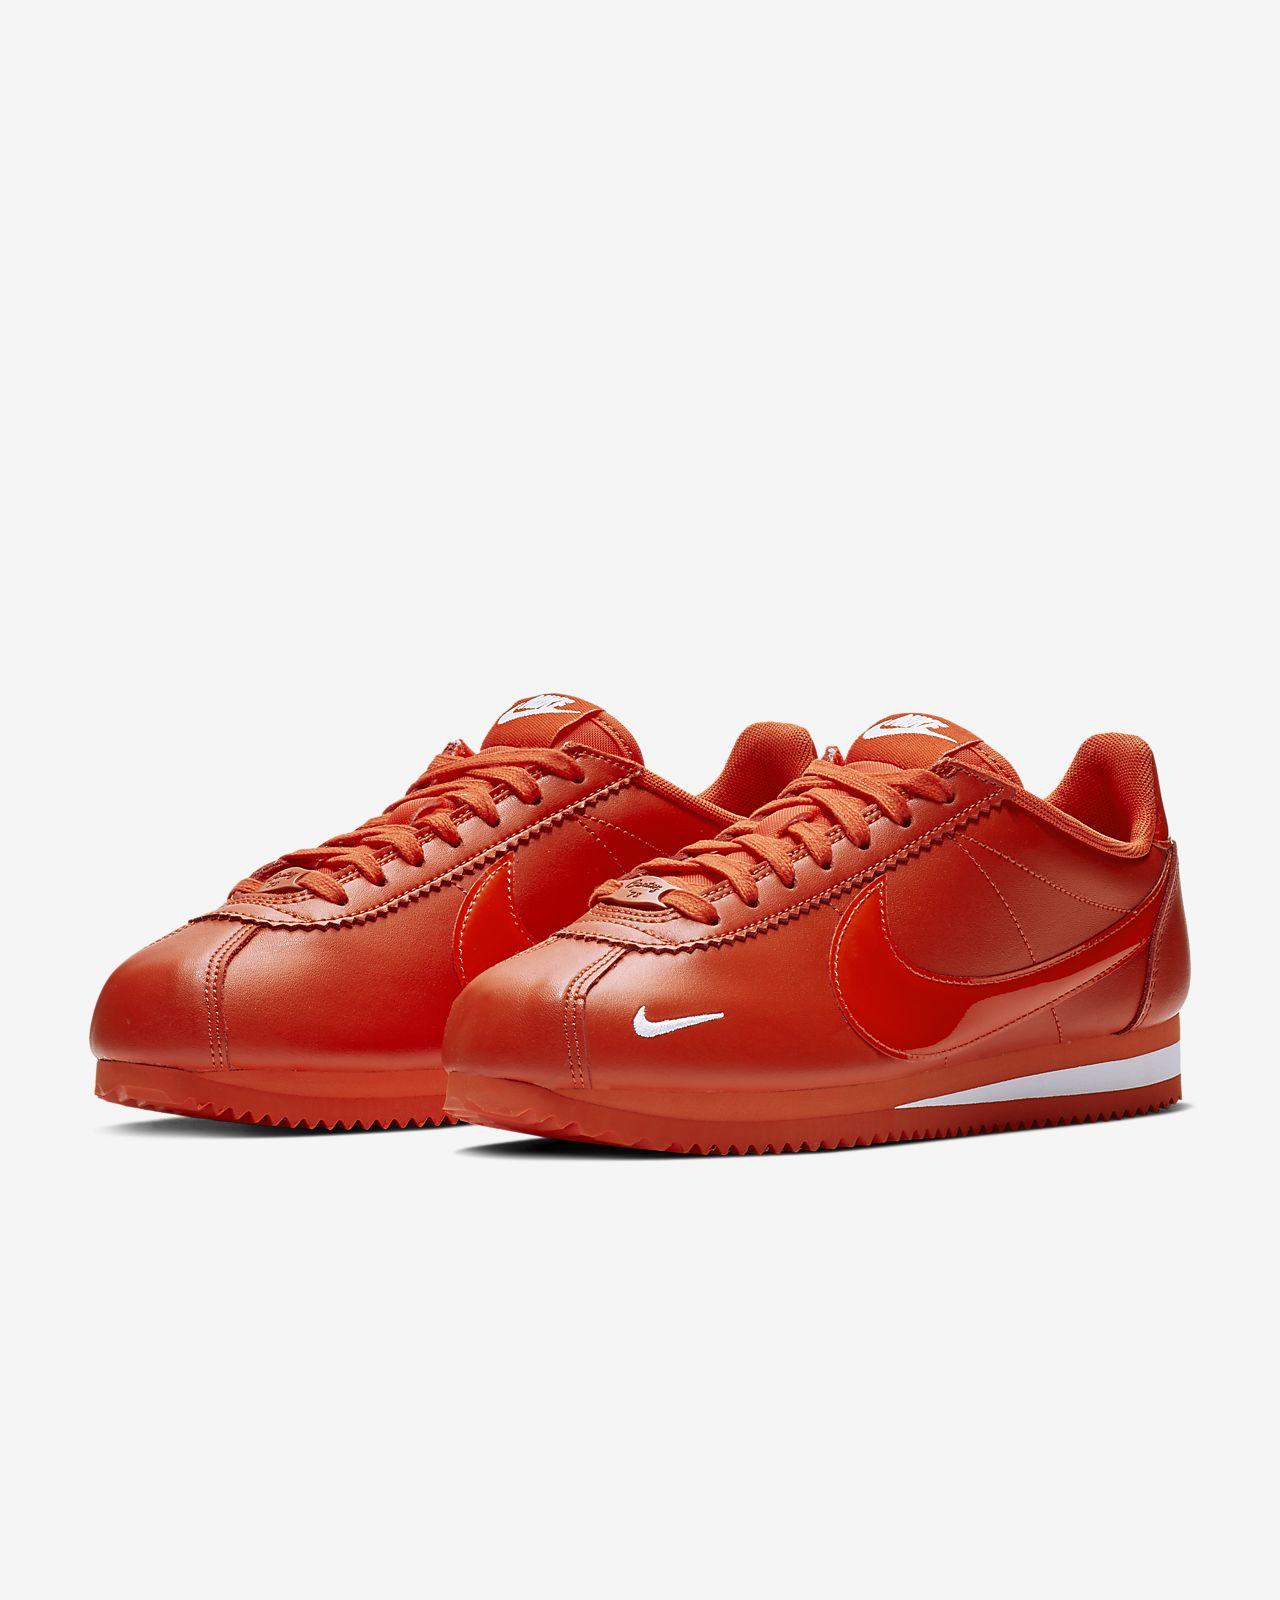 finest selection b943f ee114 ... Nike Classic Cortez Premium Women s Shoe